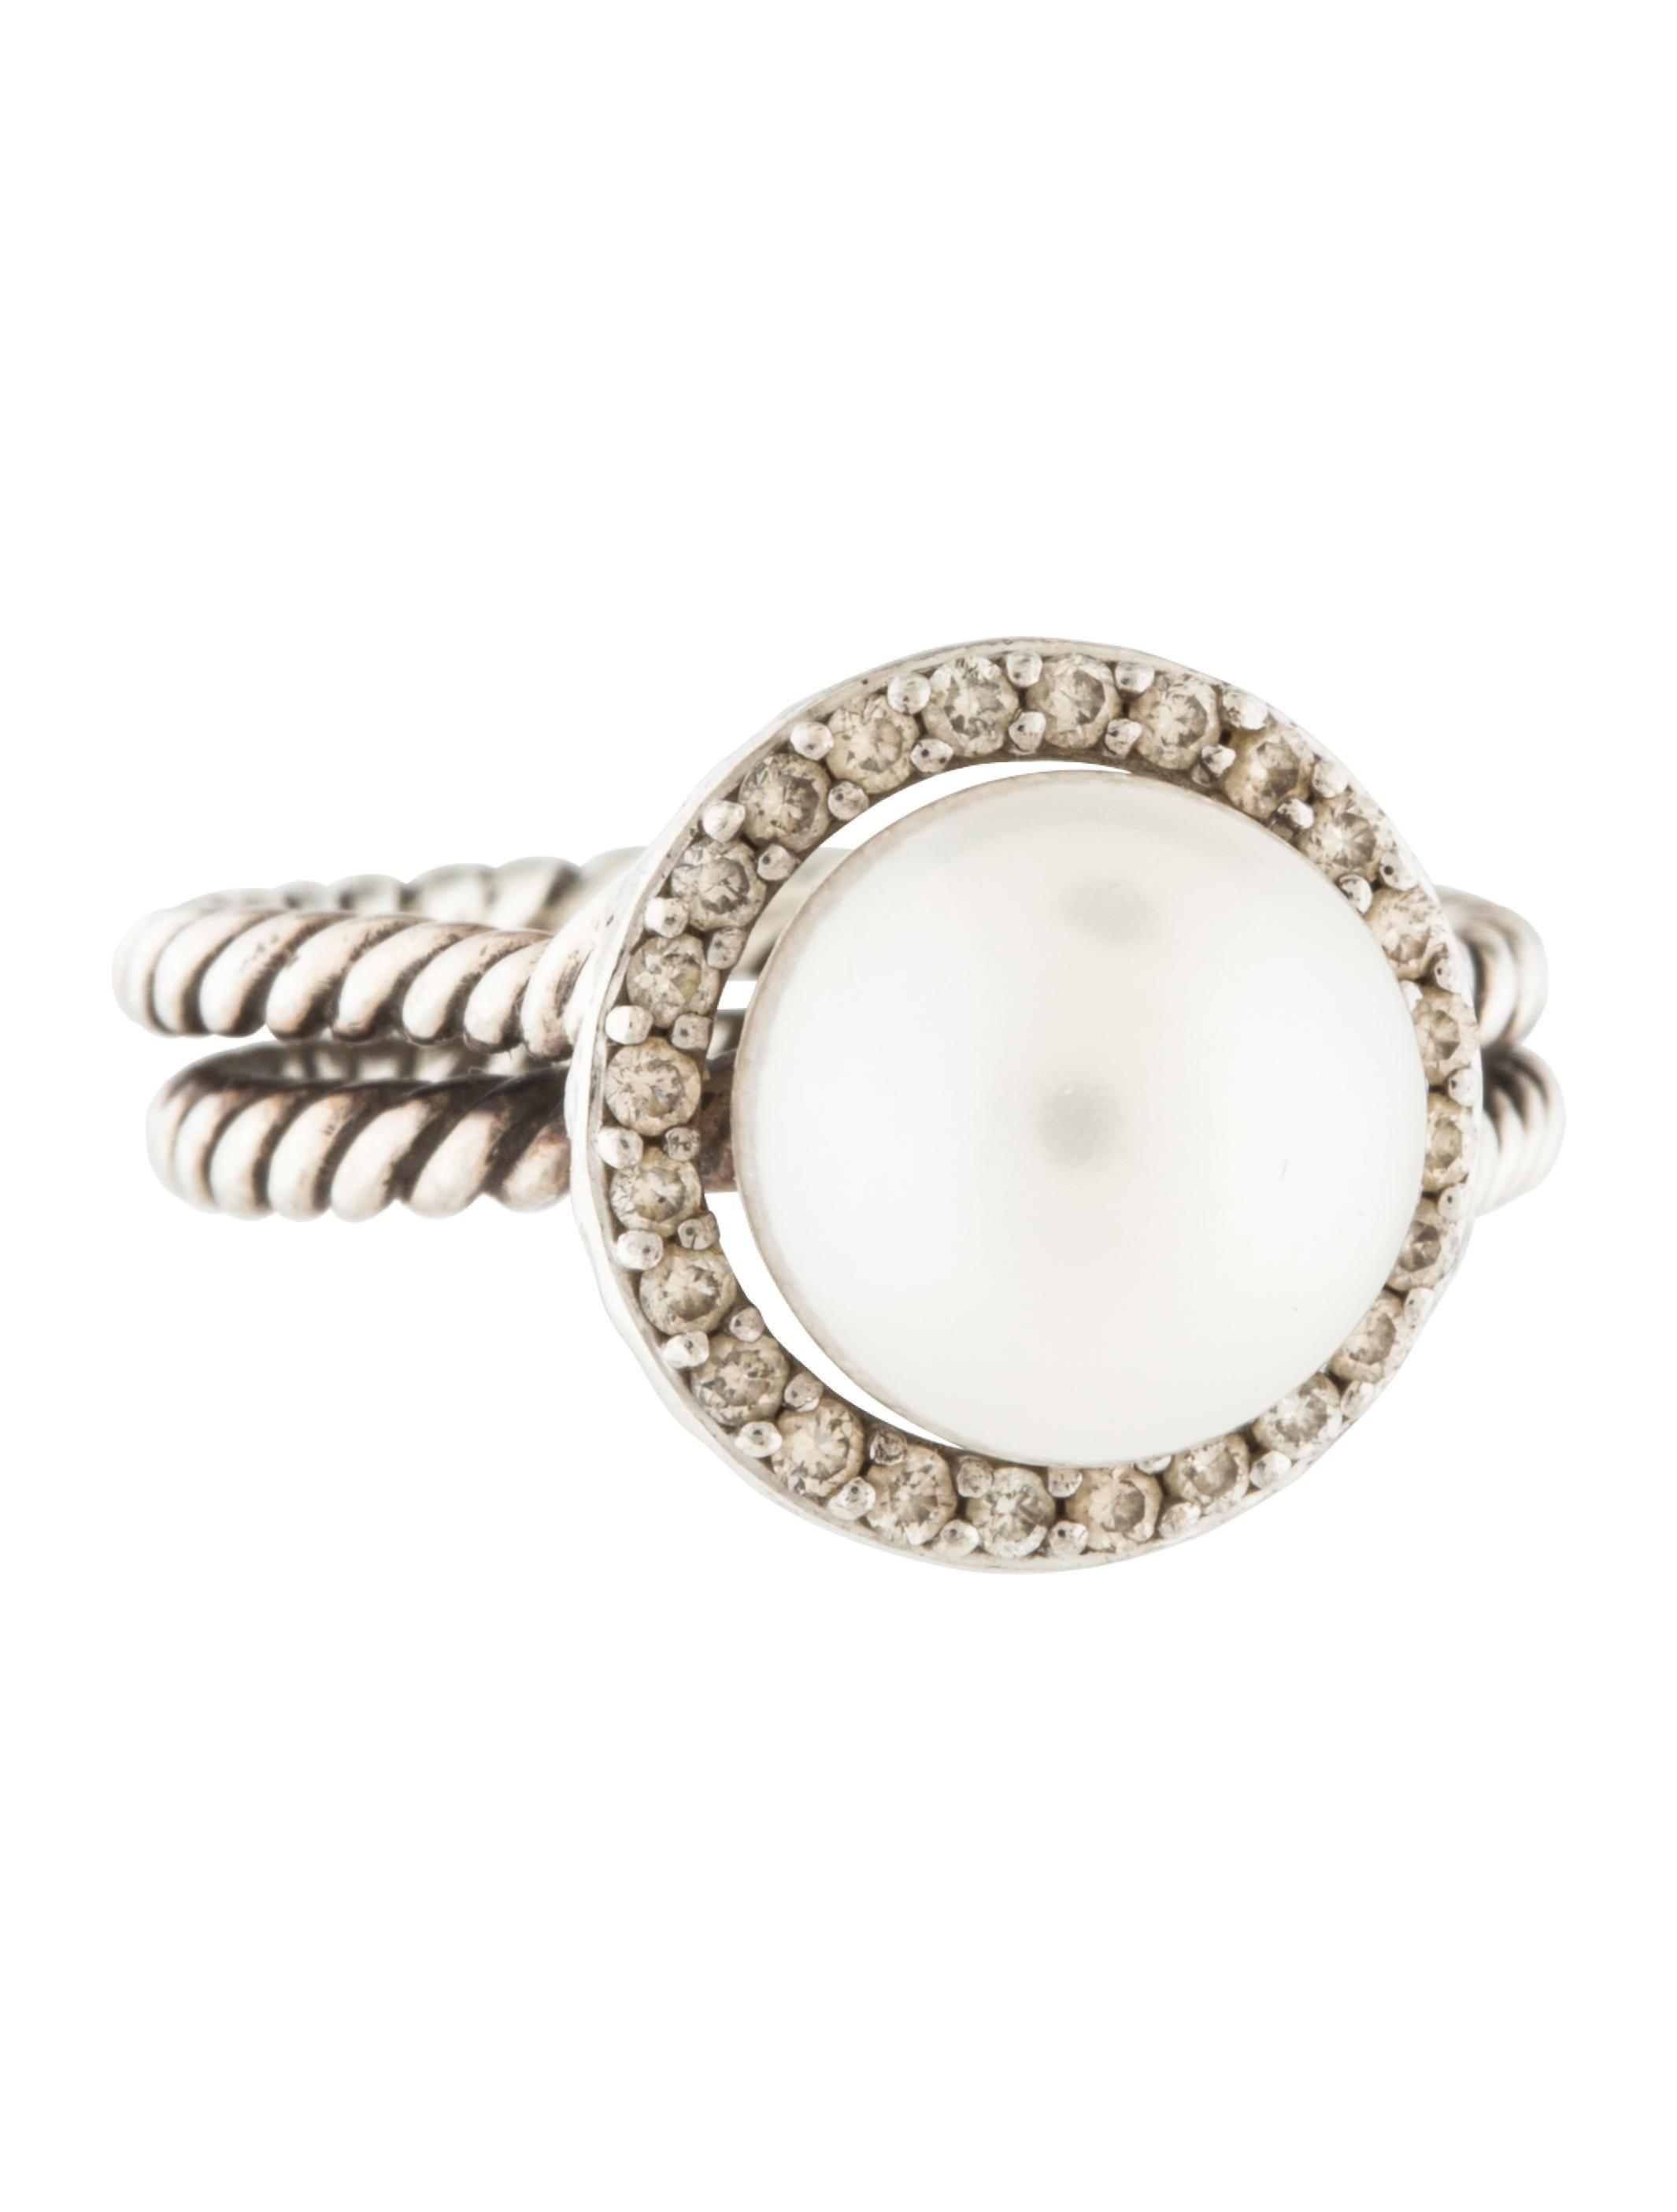 david yurman pearl ring rings dvy38910 the